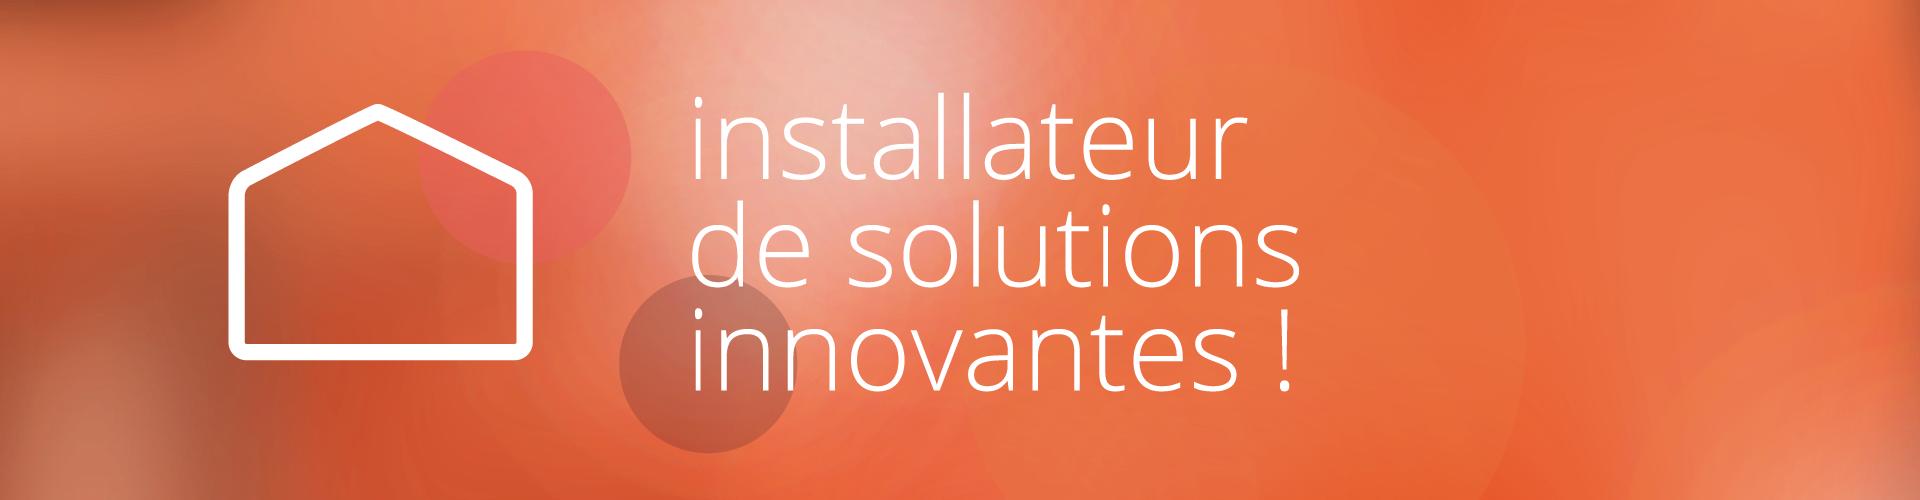 Installateur de solutions innovantes